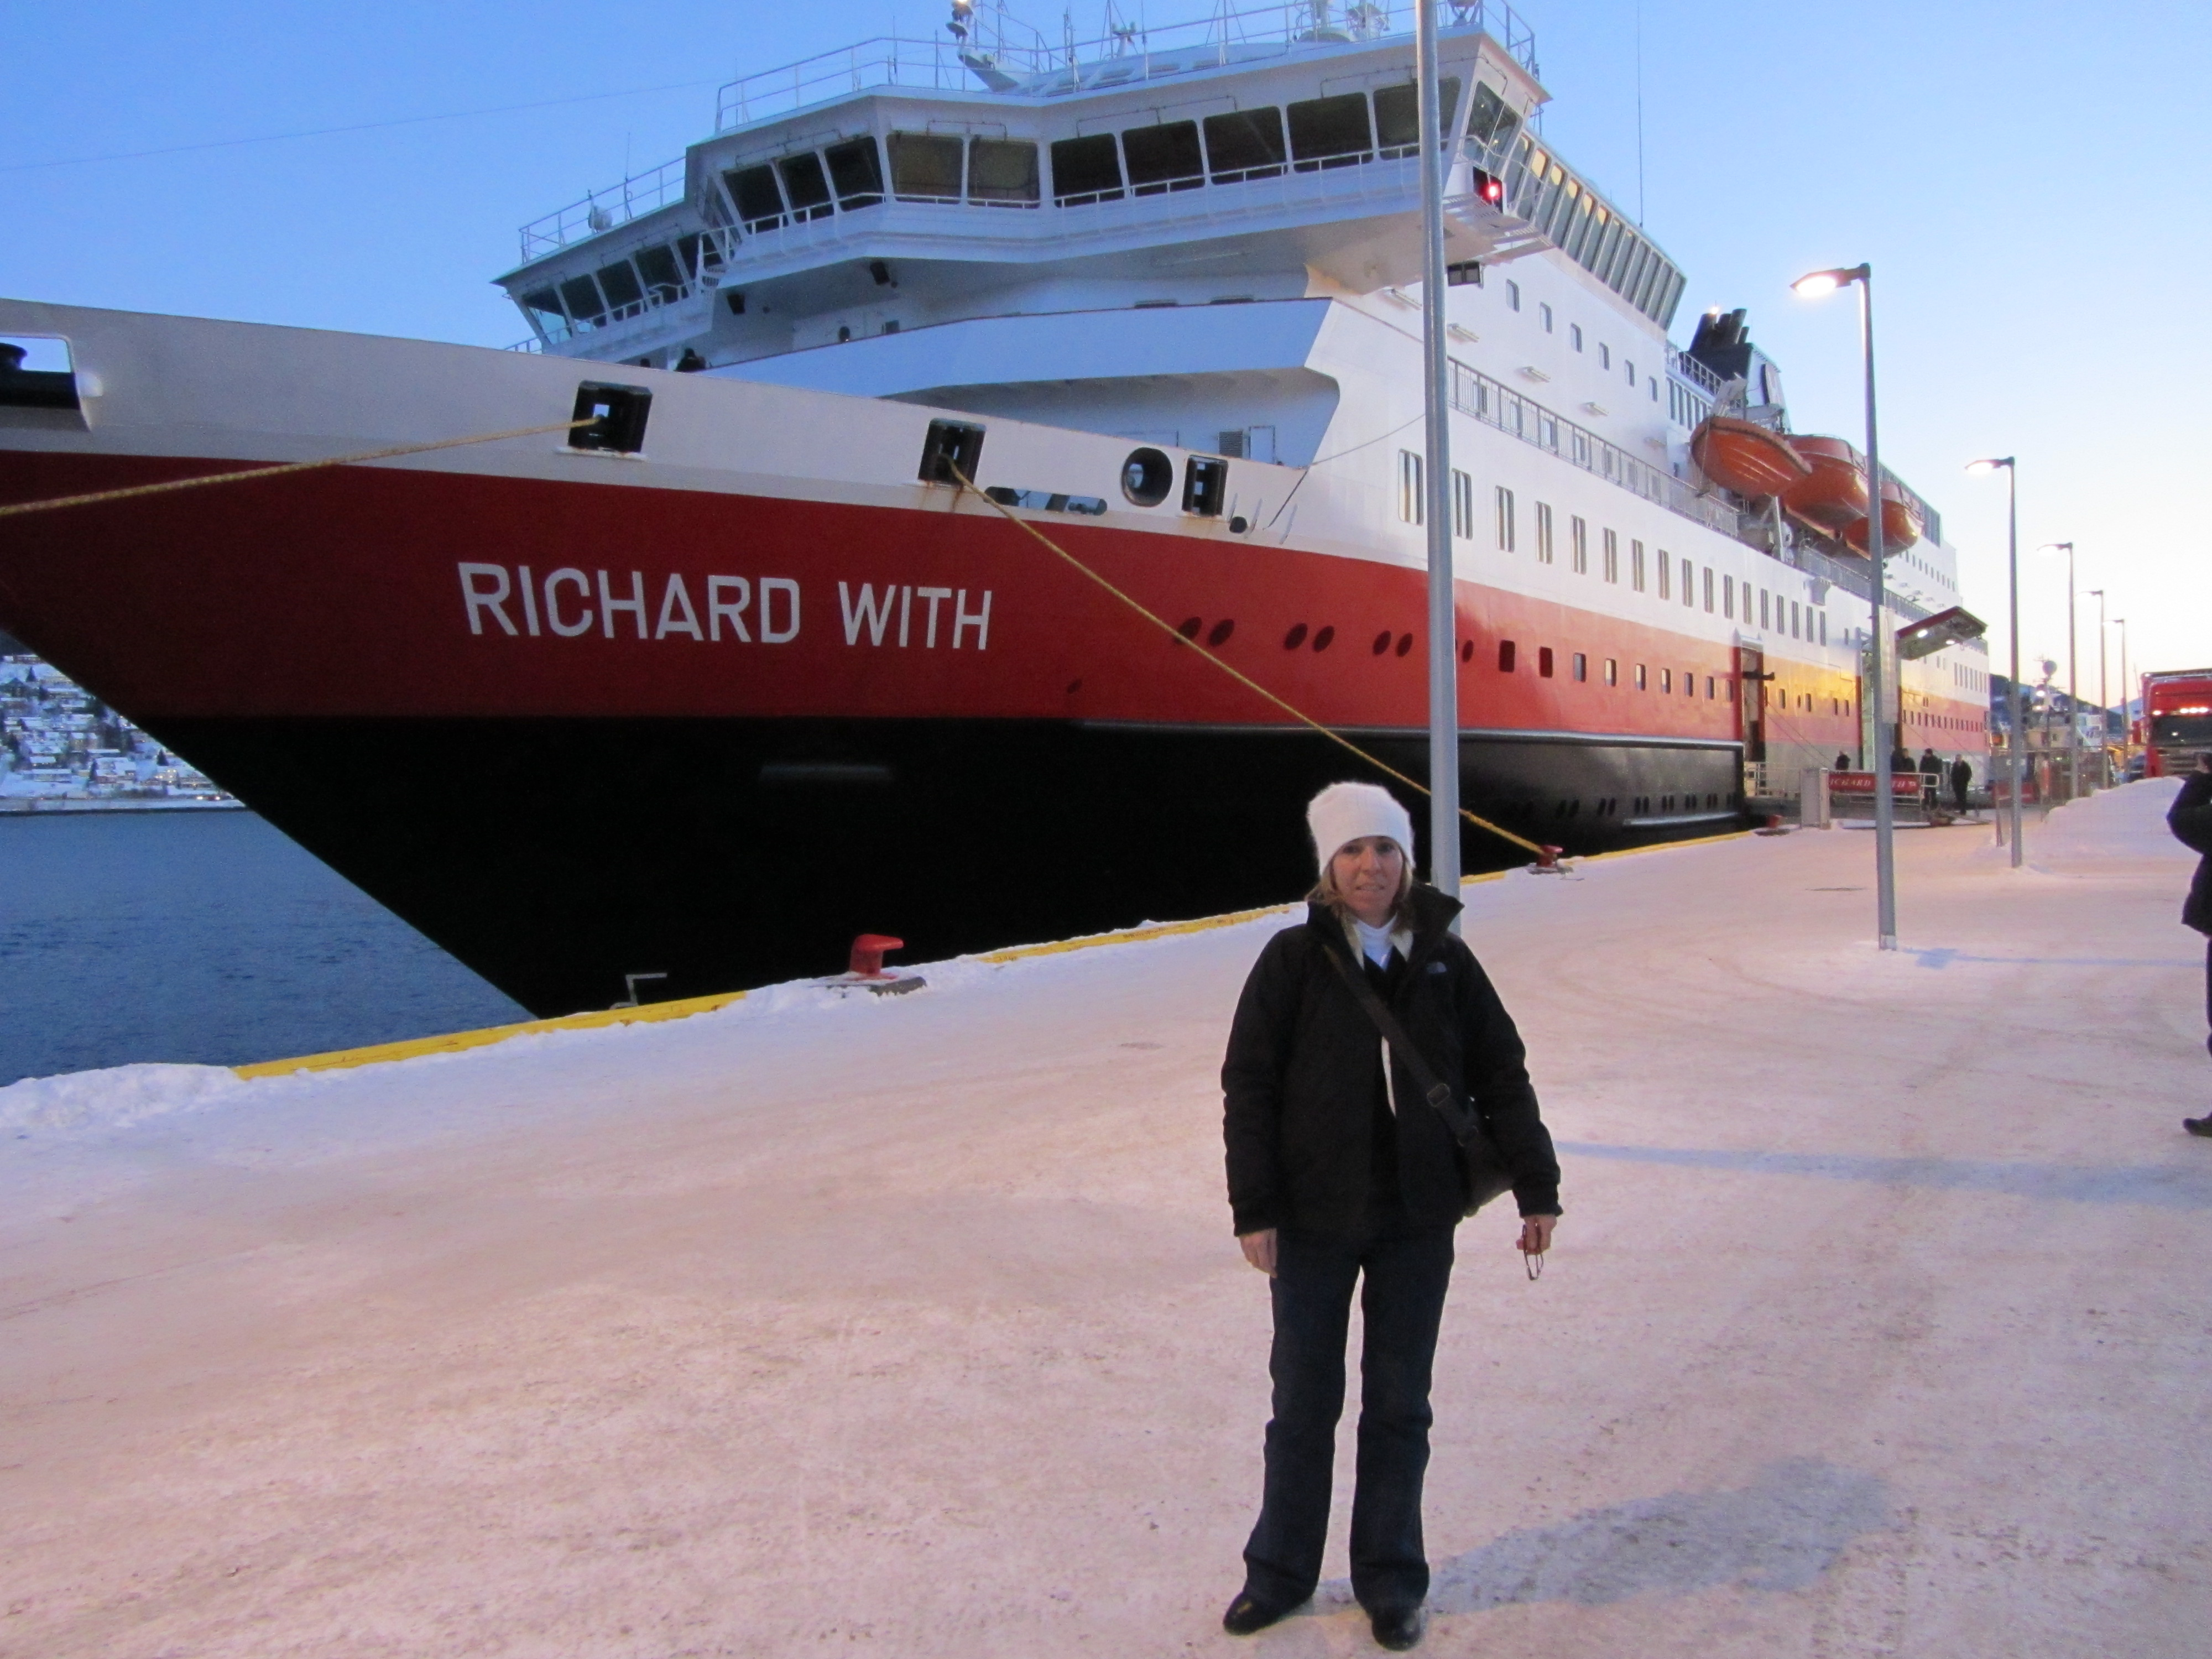 Hurtigruten Cruise Ship Ms Richard With Online Travel